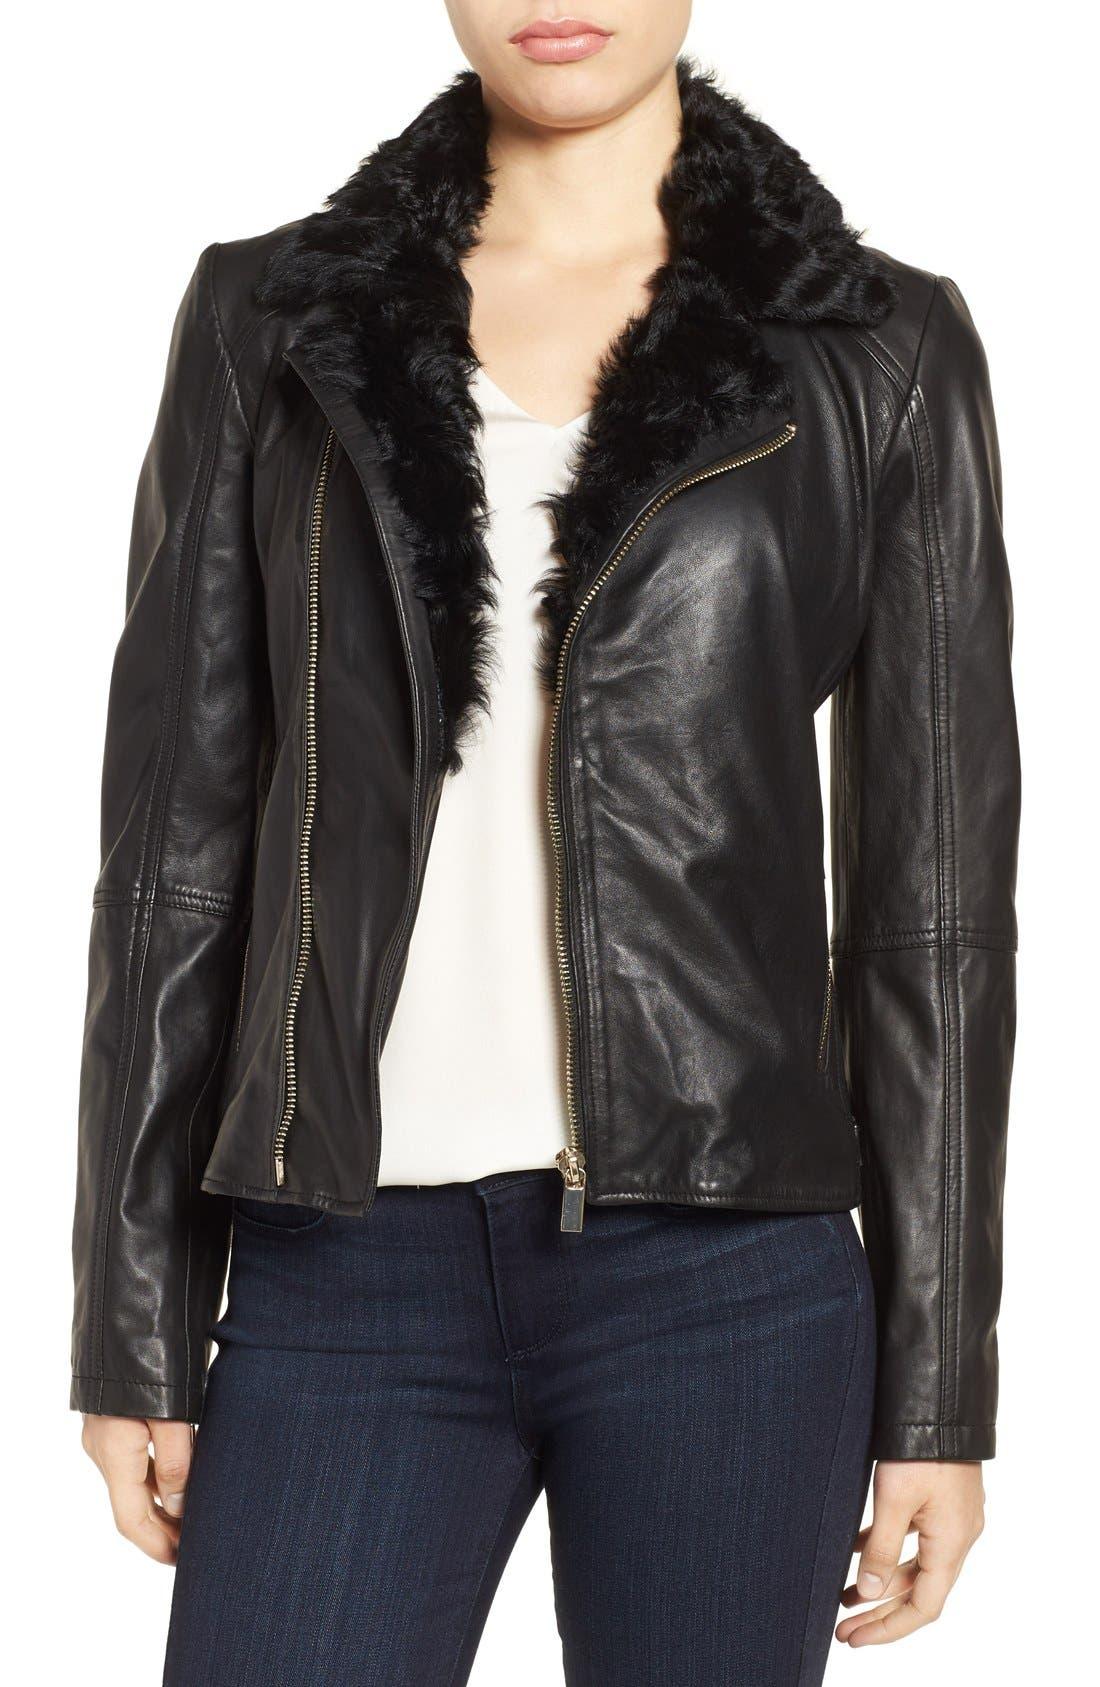 Alternate Image 1 Selected - Badgley Mischka 'Irina' Leather Moto Jacket with Genuine Shearling Collar